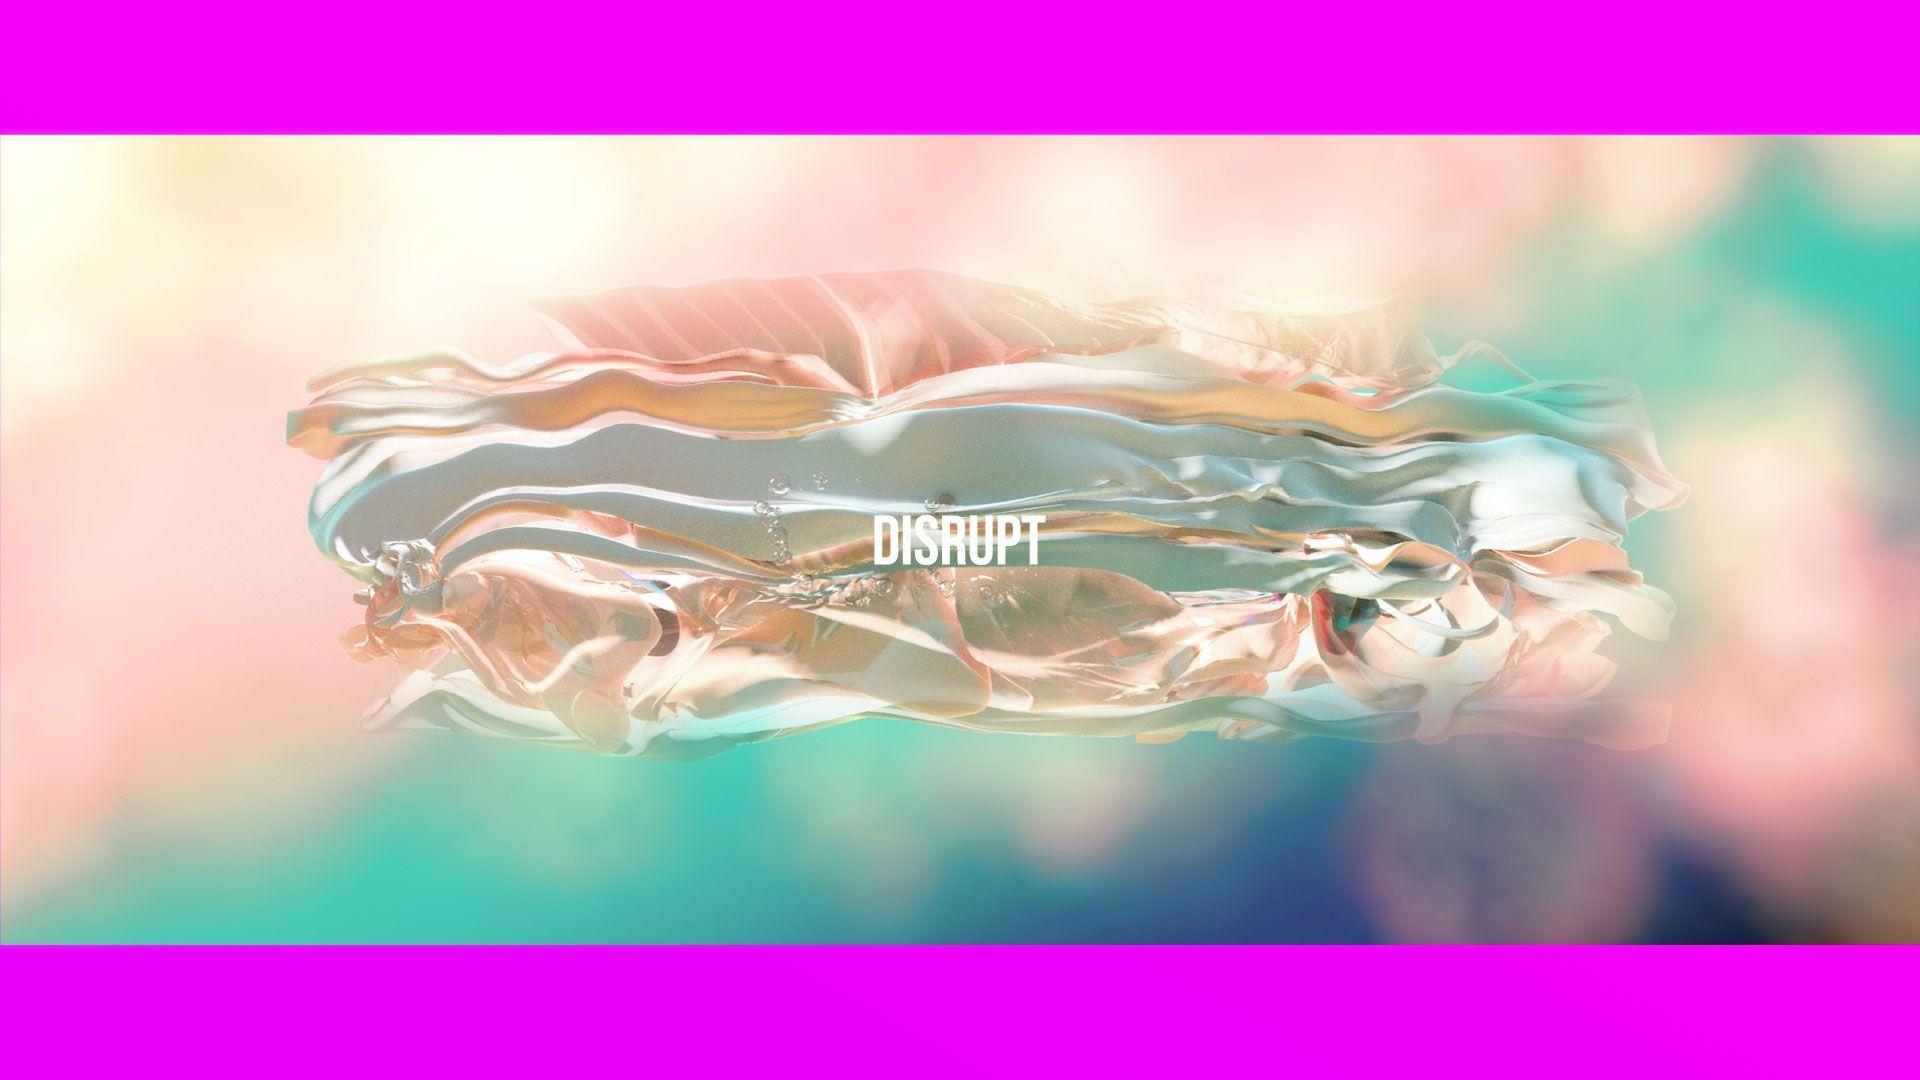 Montaje_Disrupt_1920x1080_00236